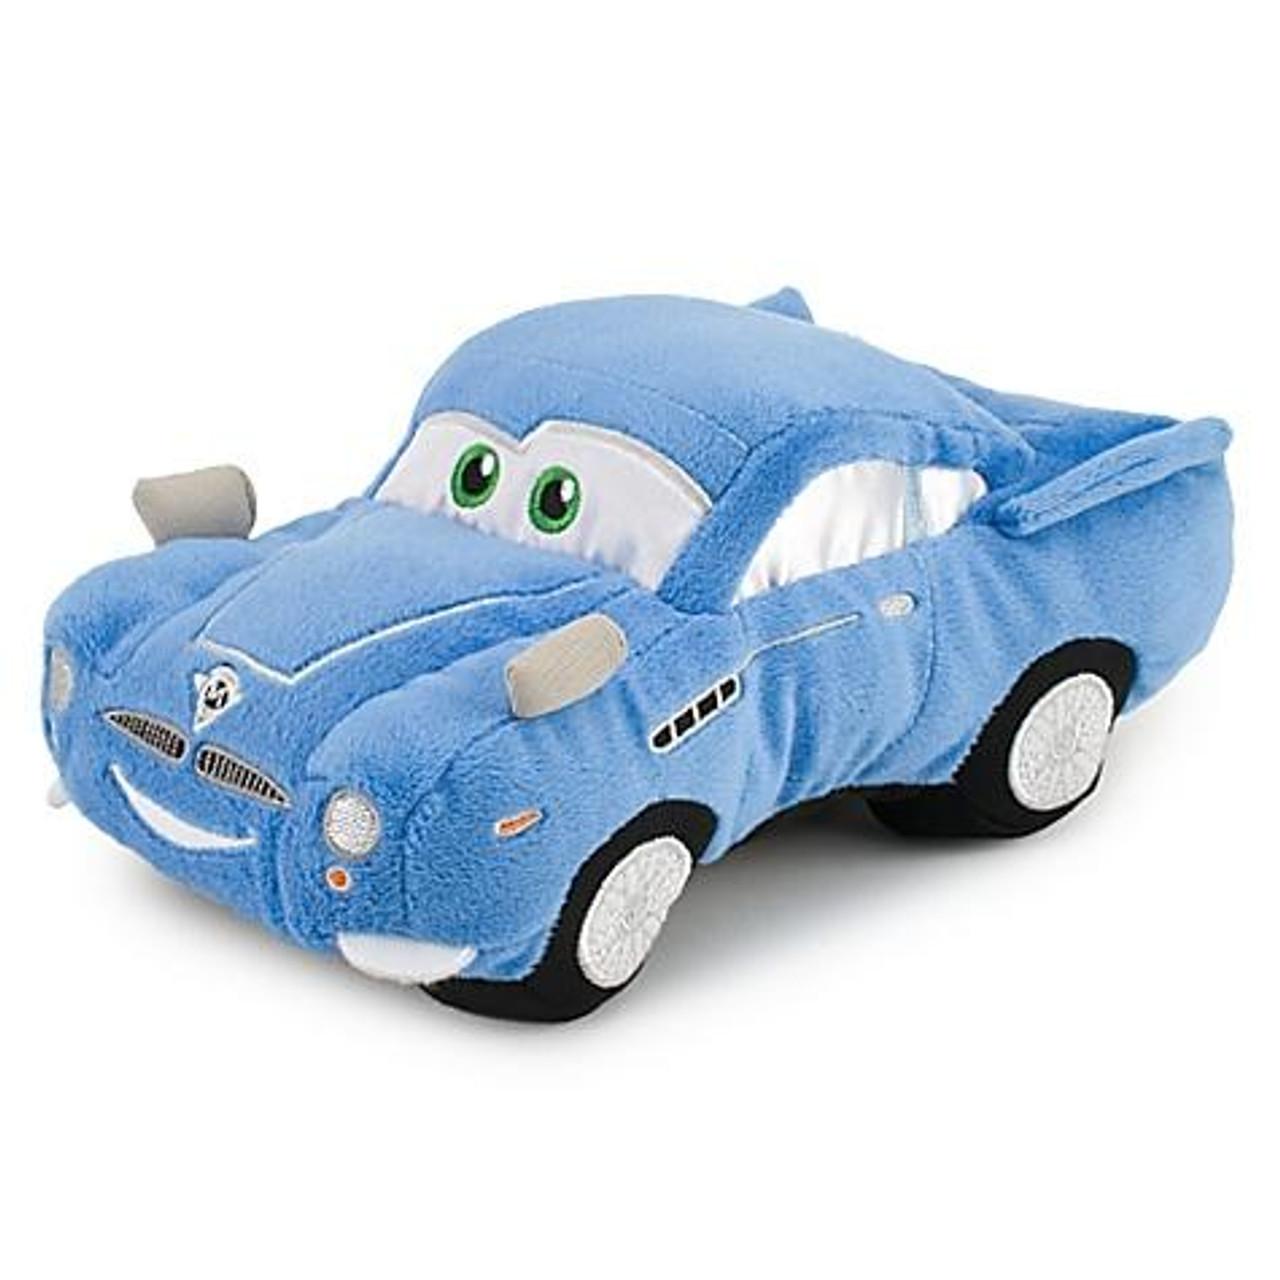 Disney Cars Cars 2 Plush Finn McMissile Exclusive 9-Inch Plush [9 Inch]